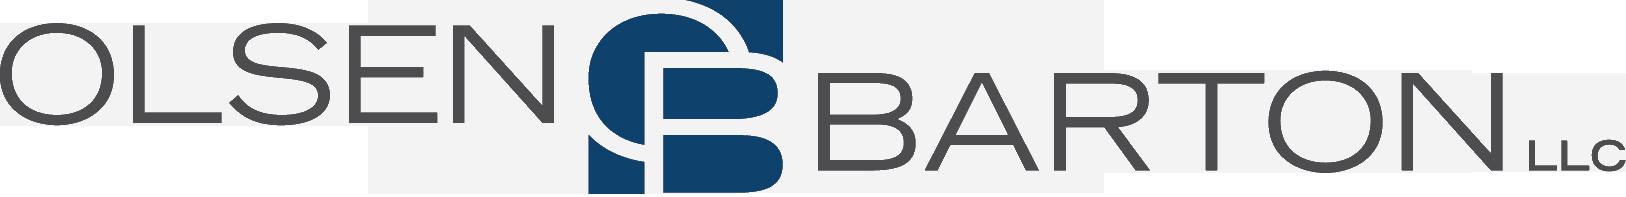 Olsen Barton LLC | Portland Eminent Domain & Condemnation Lawyers